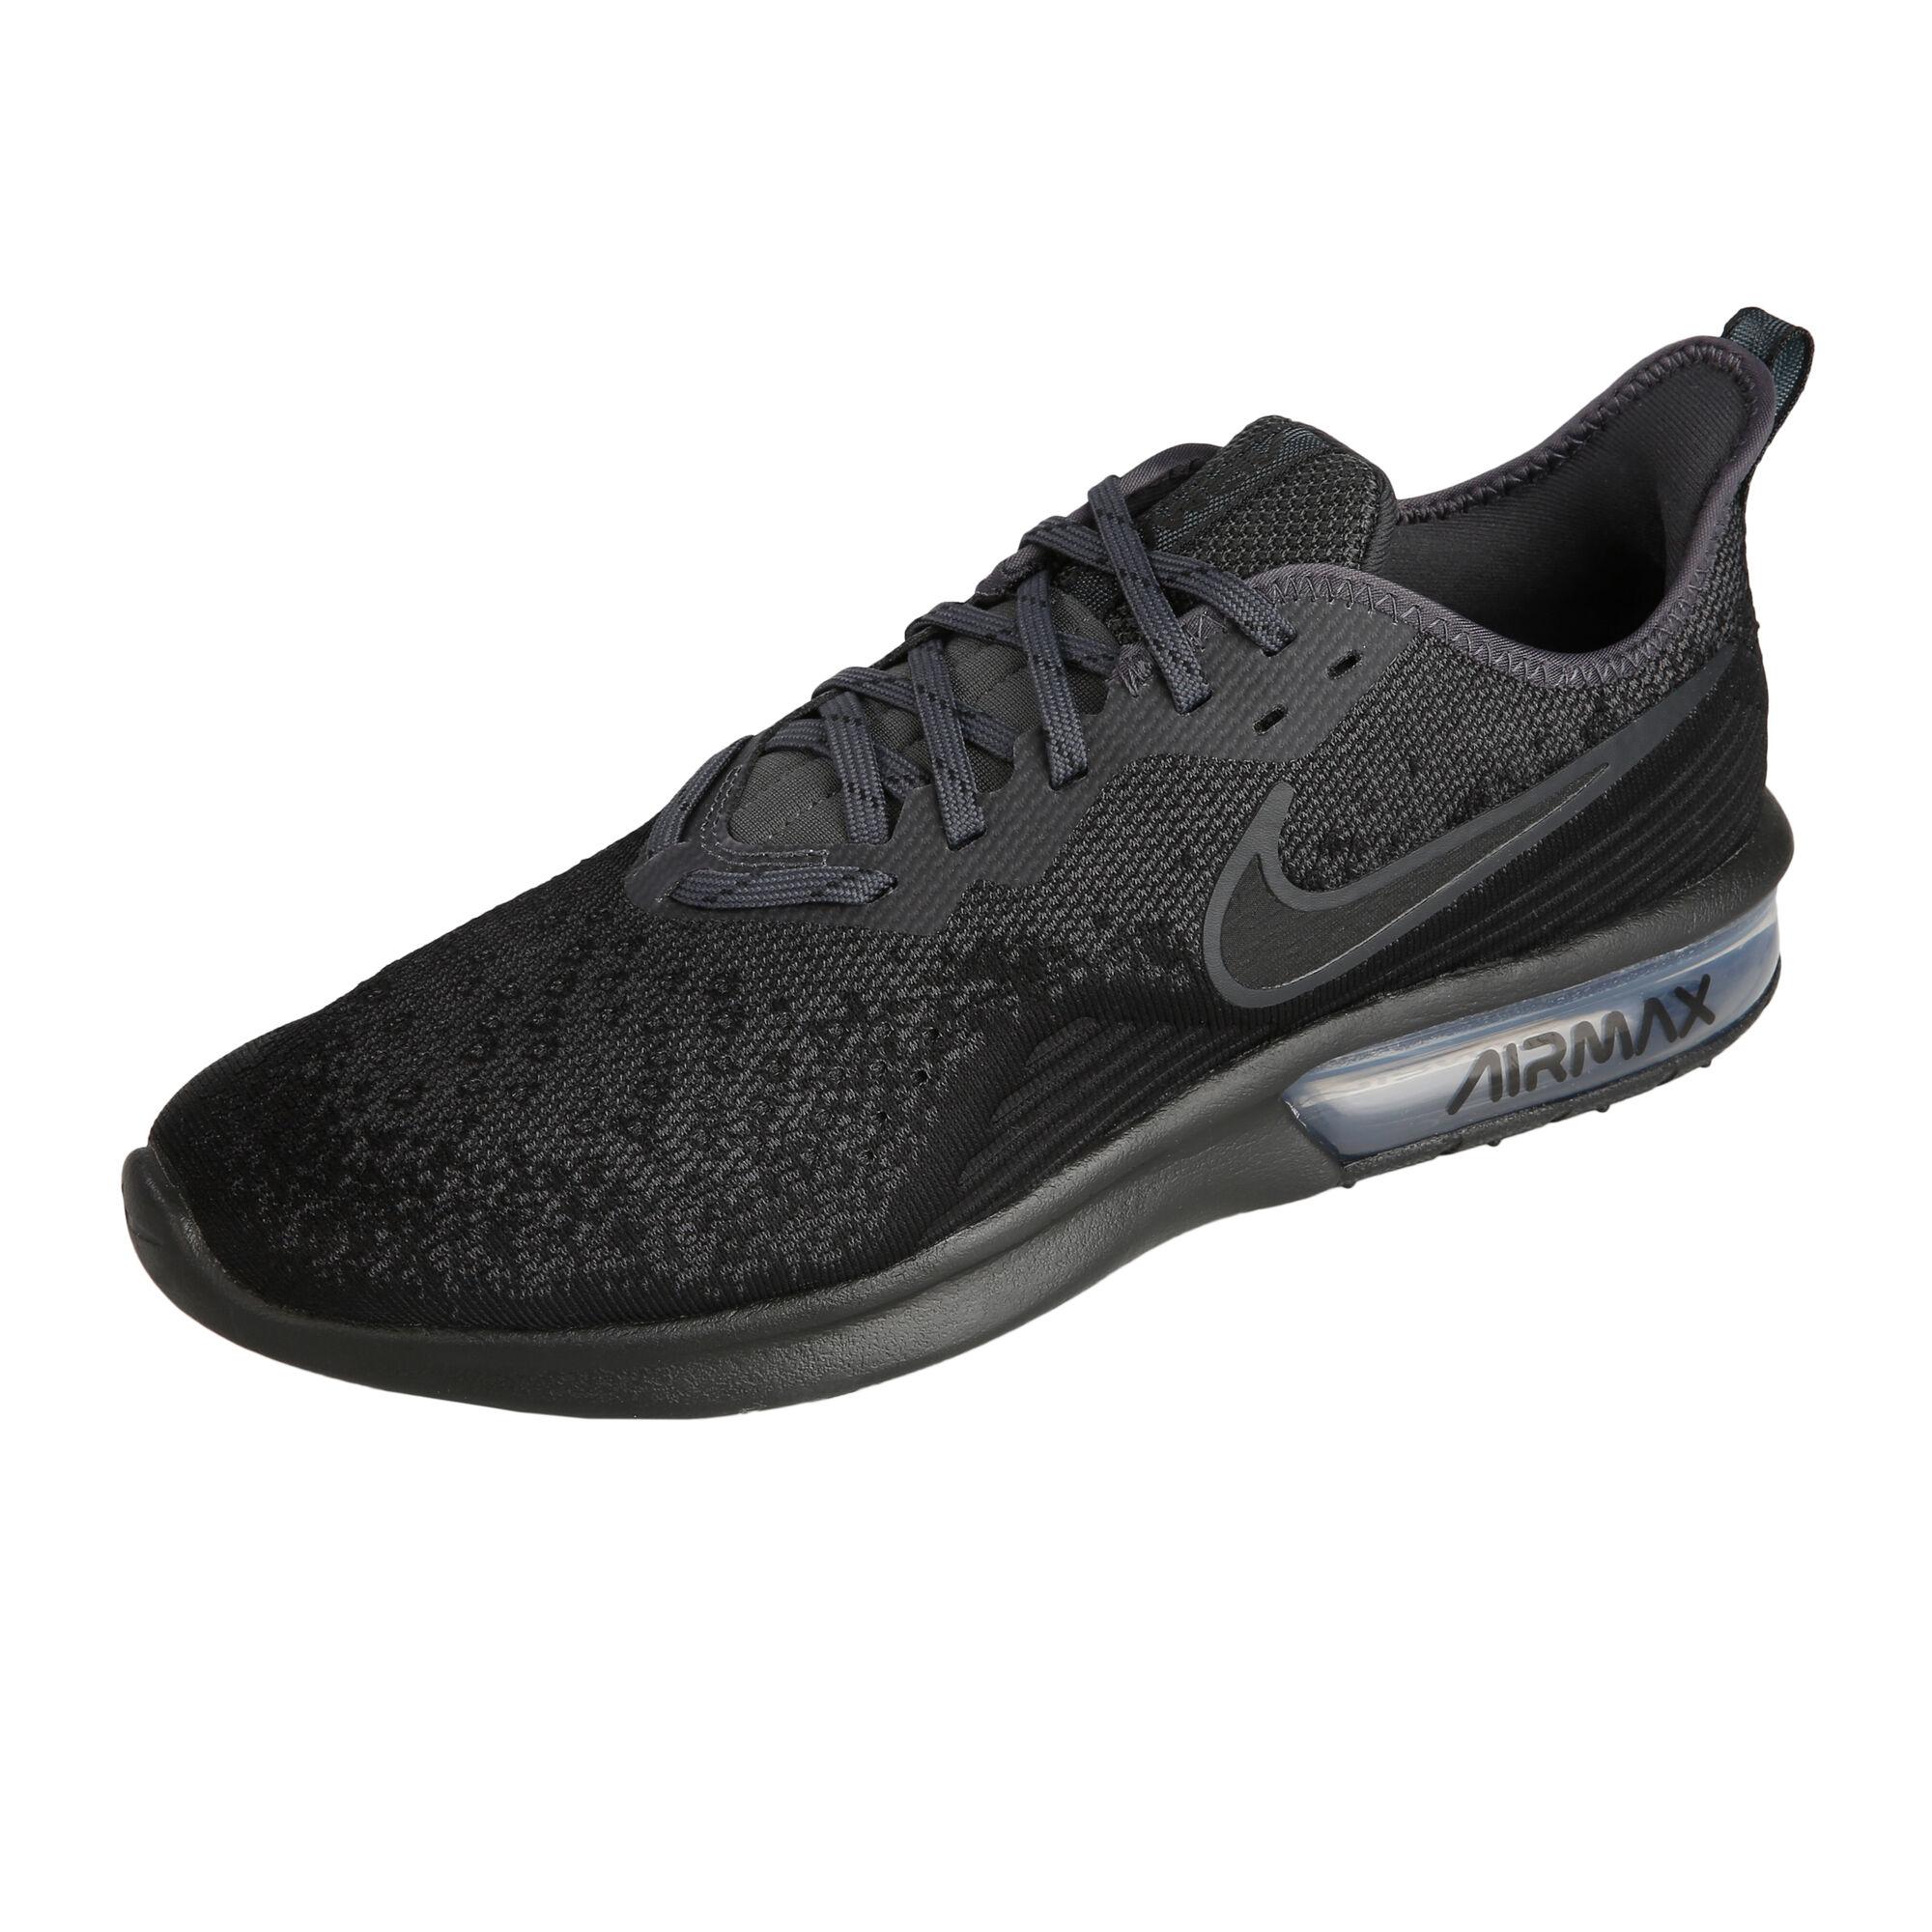 uk availability 17dd3 b75ba Nike Nike Nike Nike Nike Nike Nike Nike Nike. Air Max Sequent 4 Men  ...